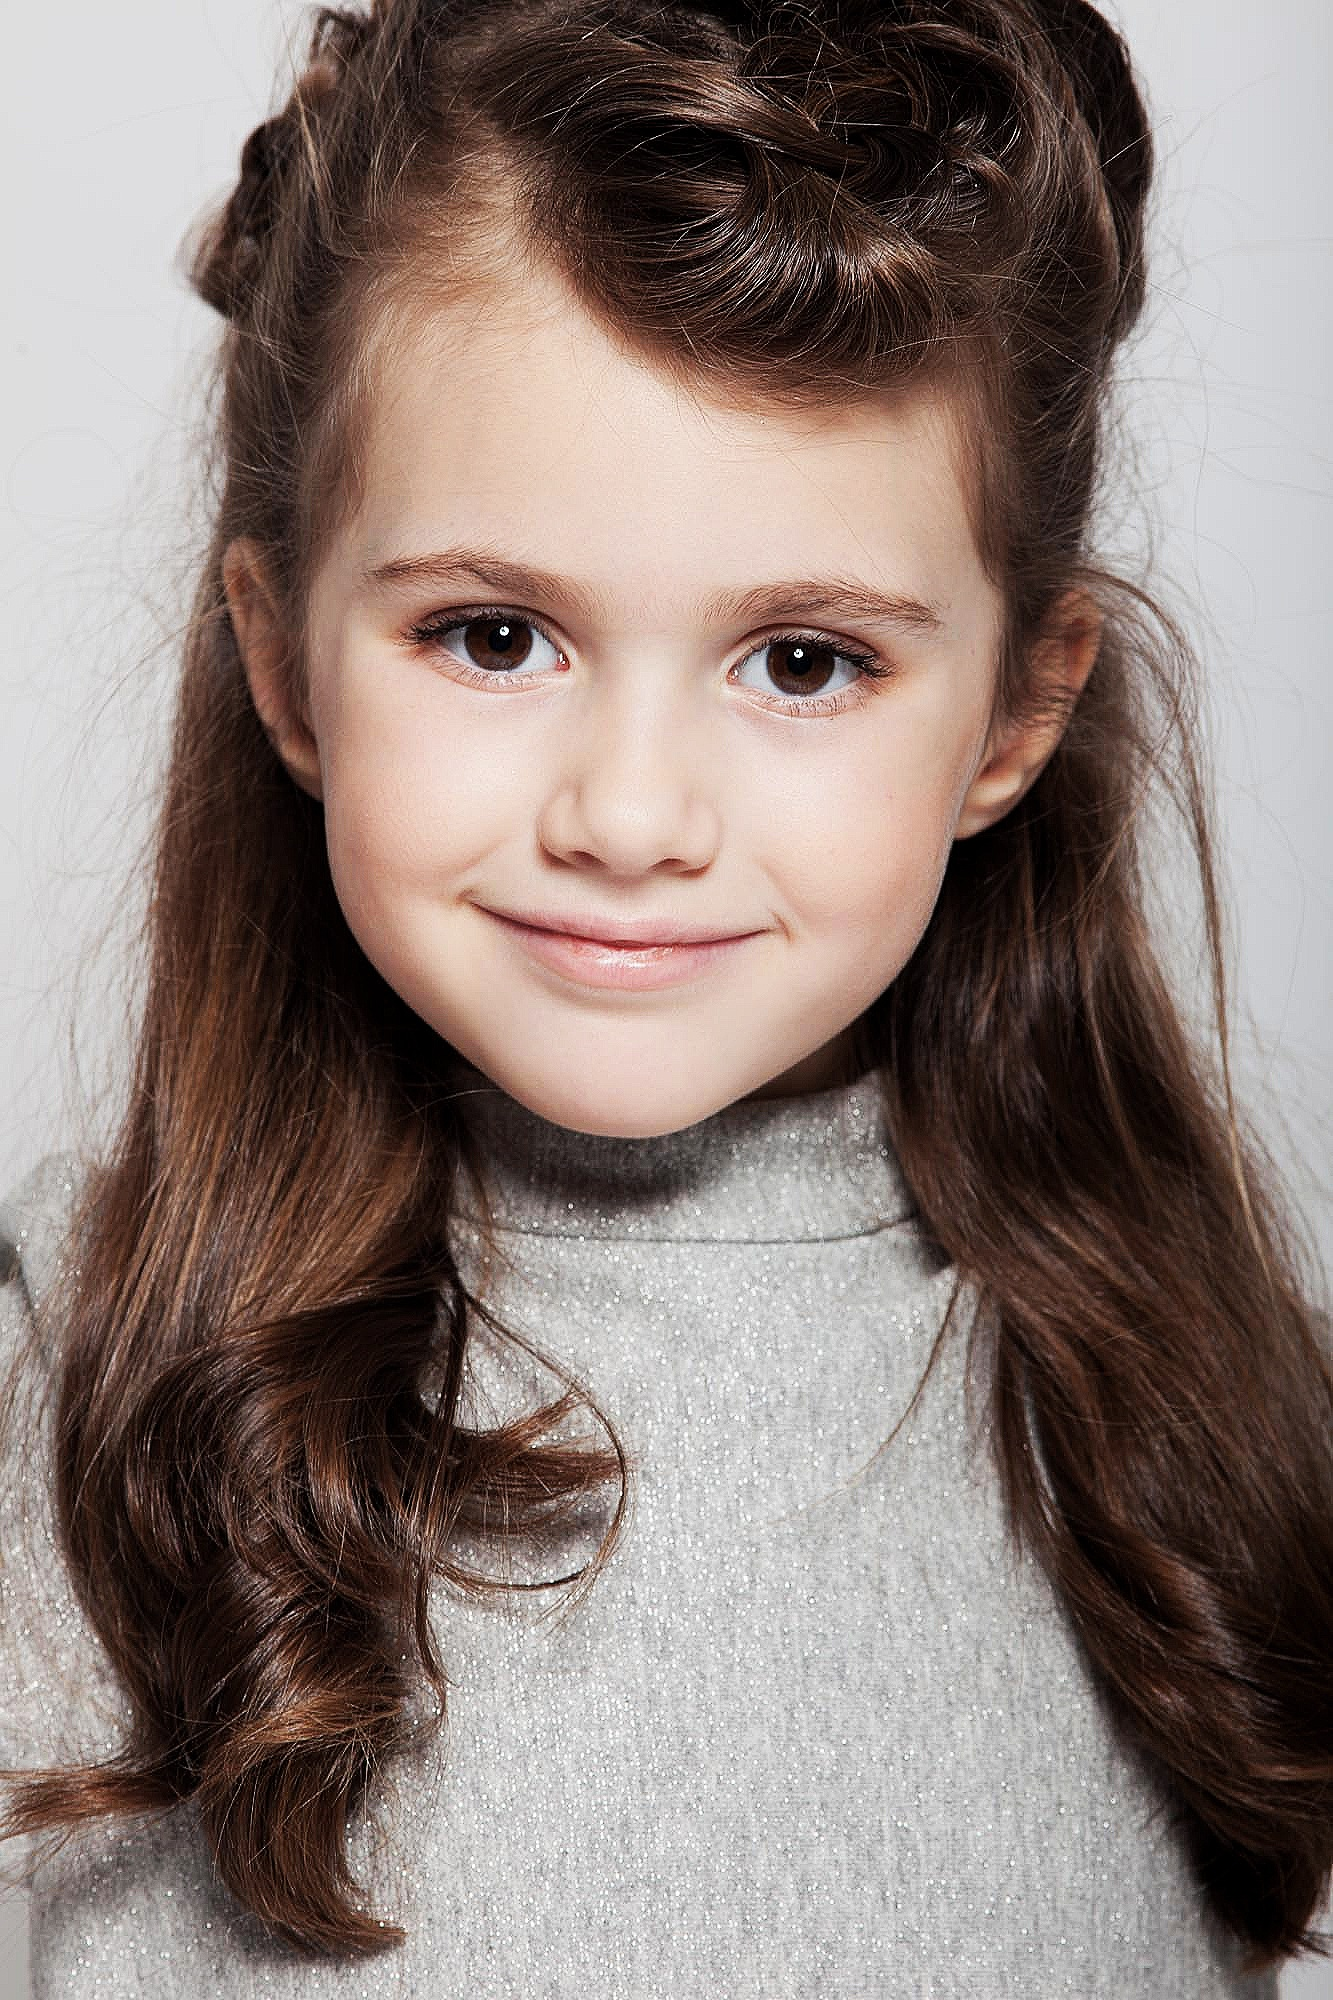 nyc-photographers-kids-modeling-10014.jpg